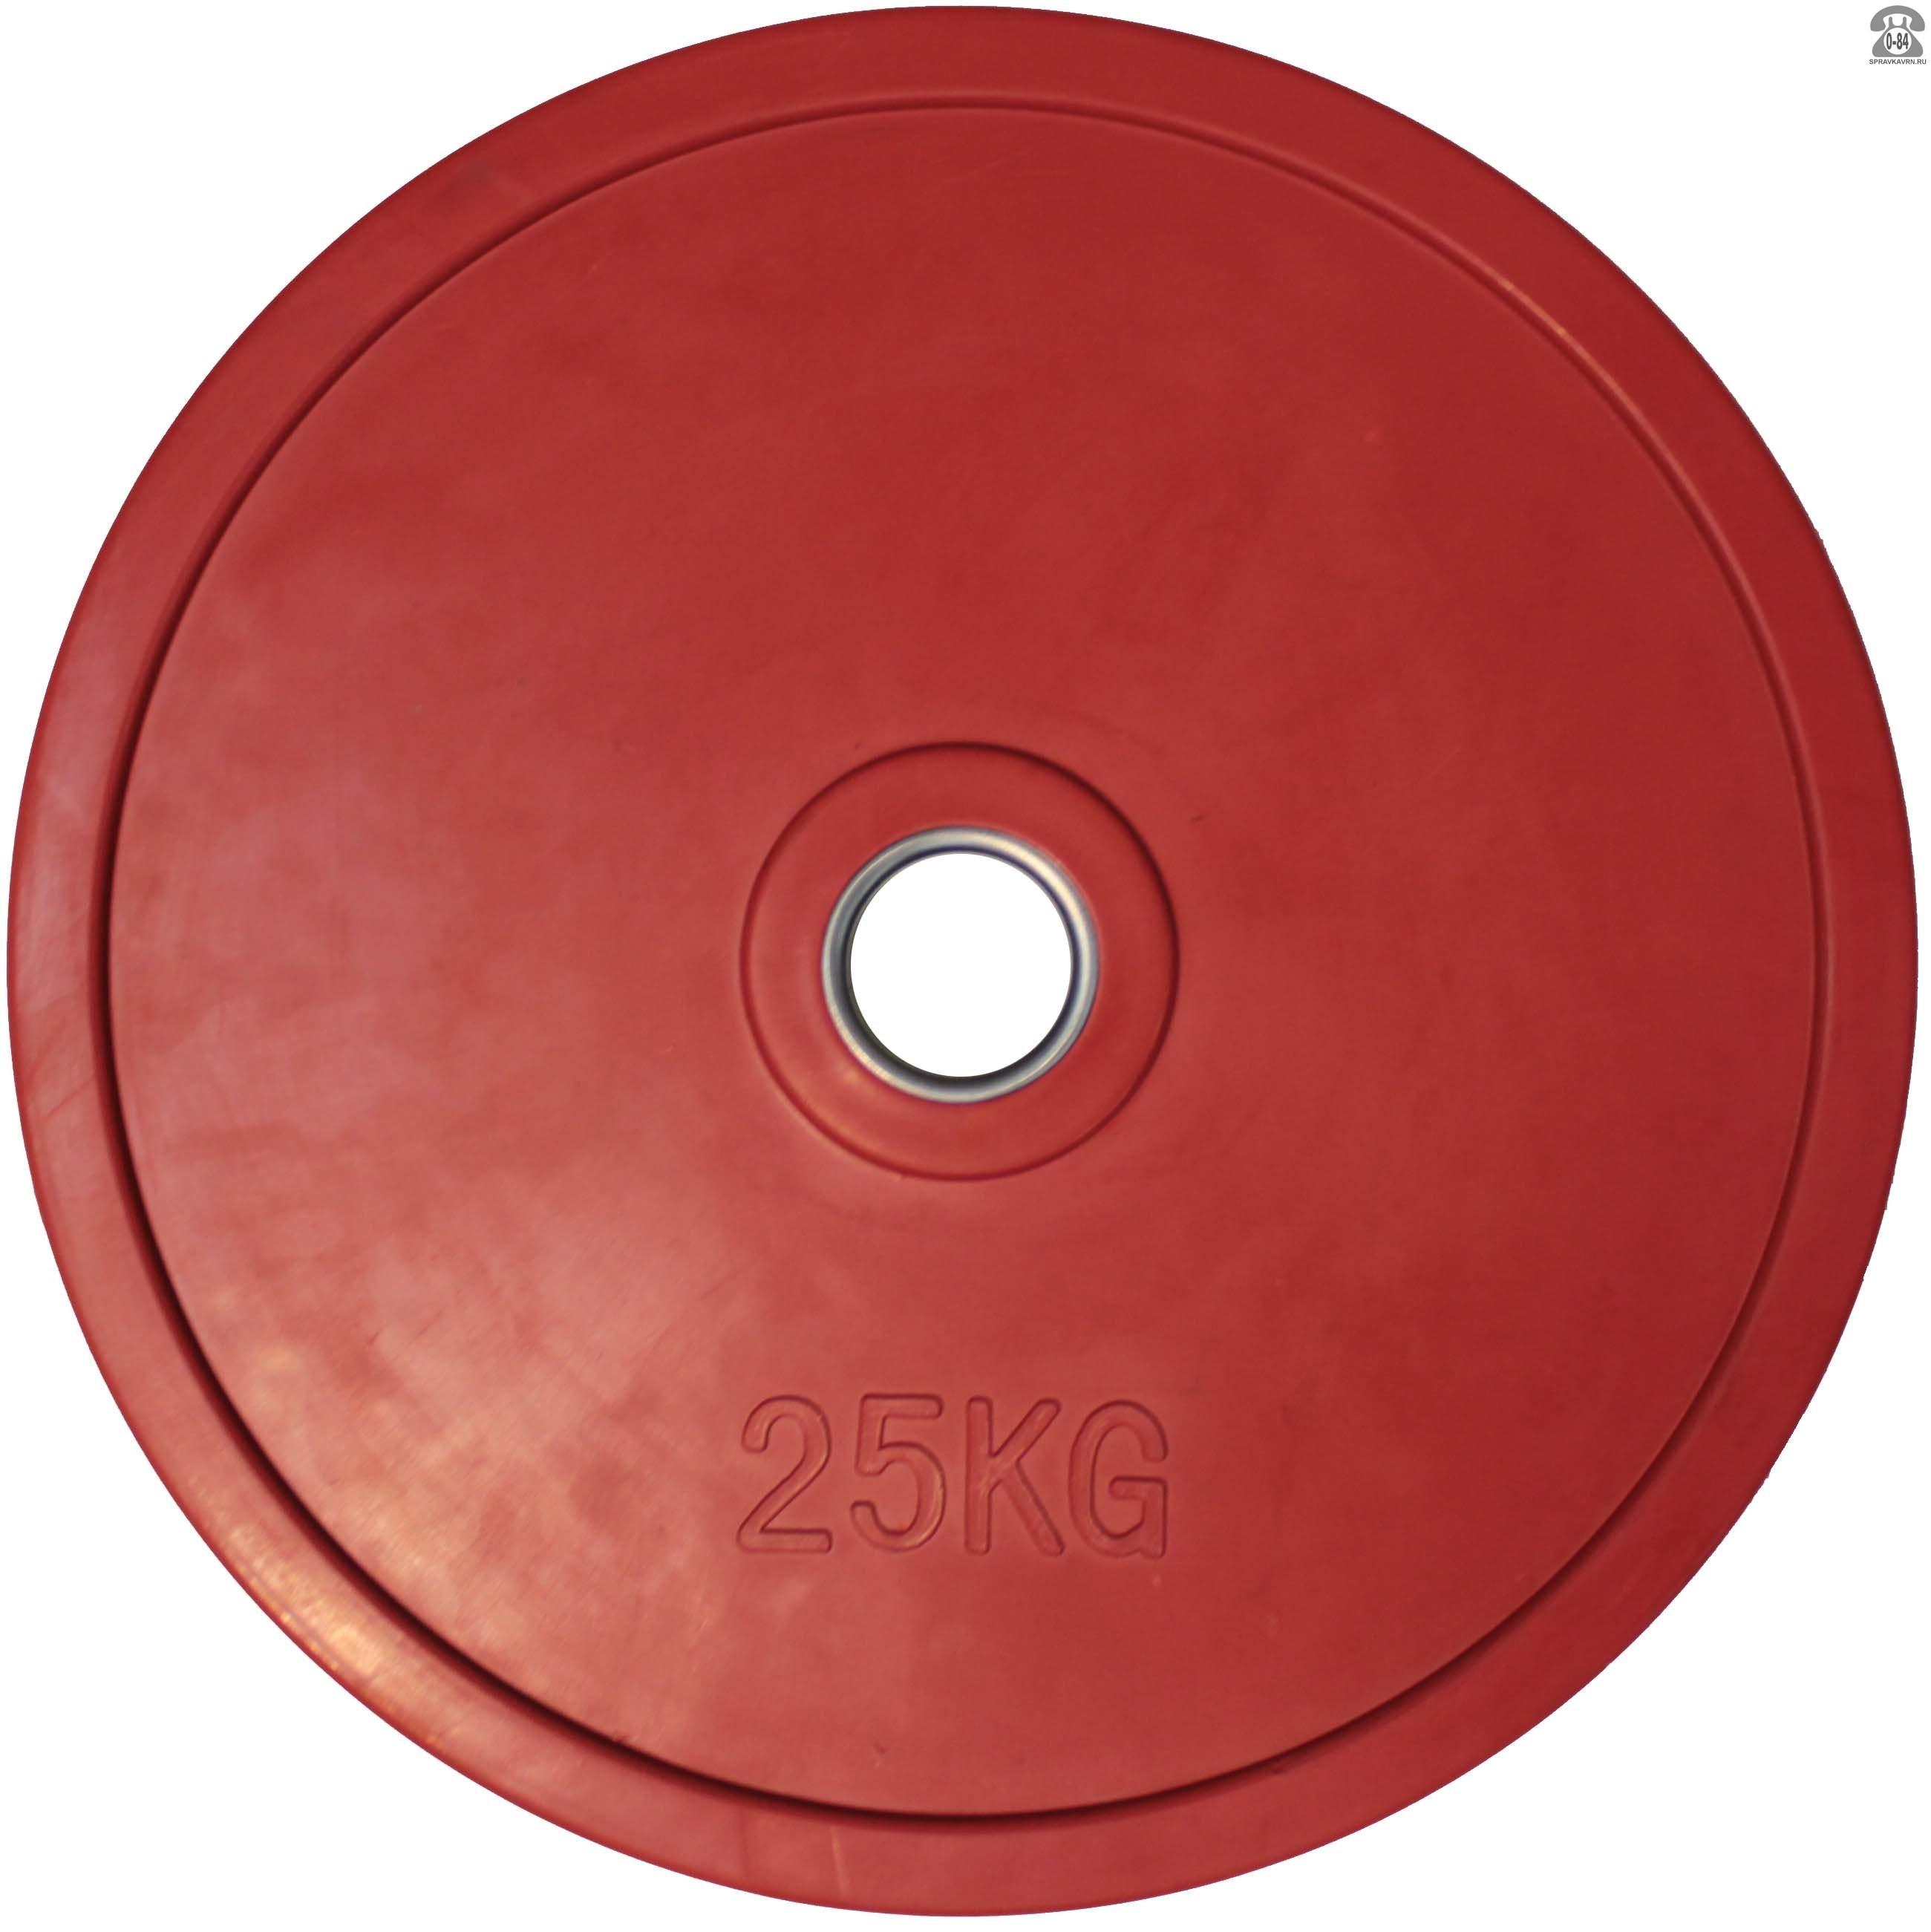 Диск для штанги Олимпийский 25 кг